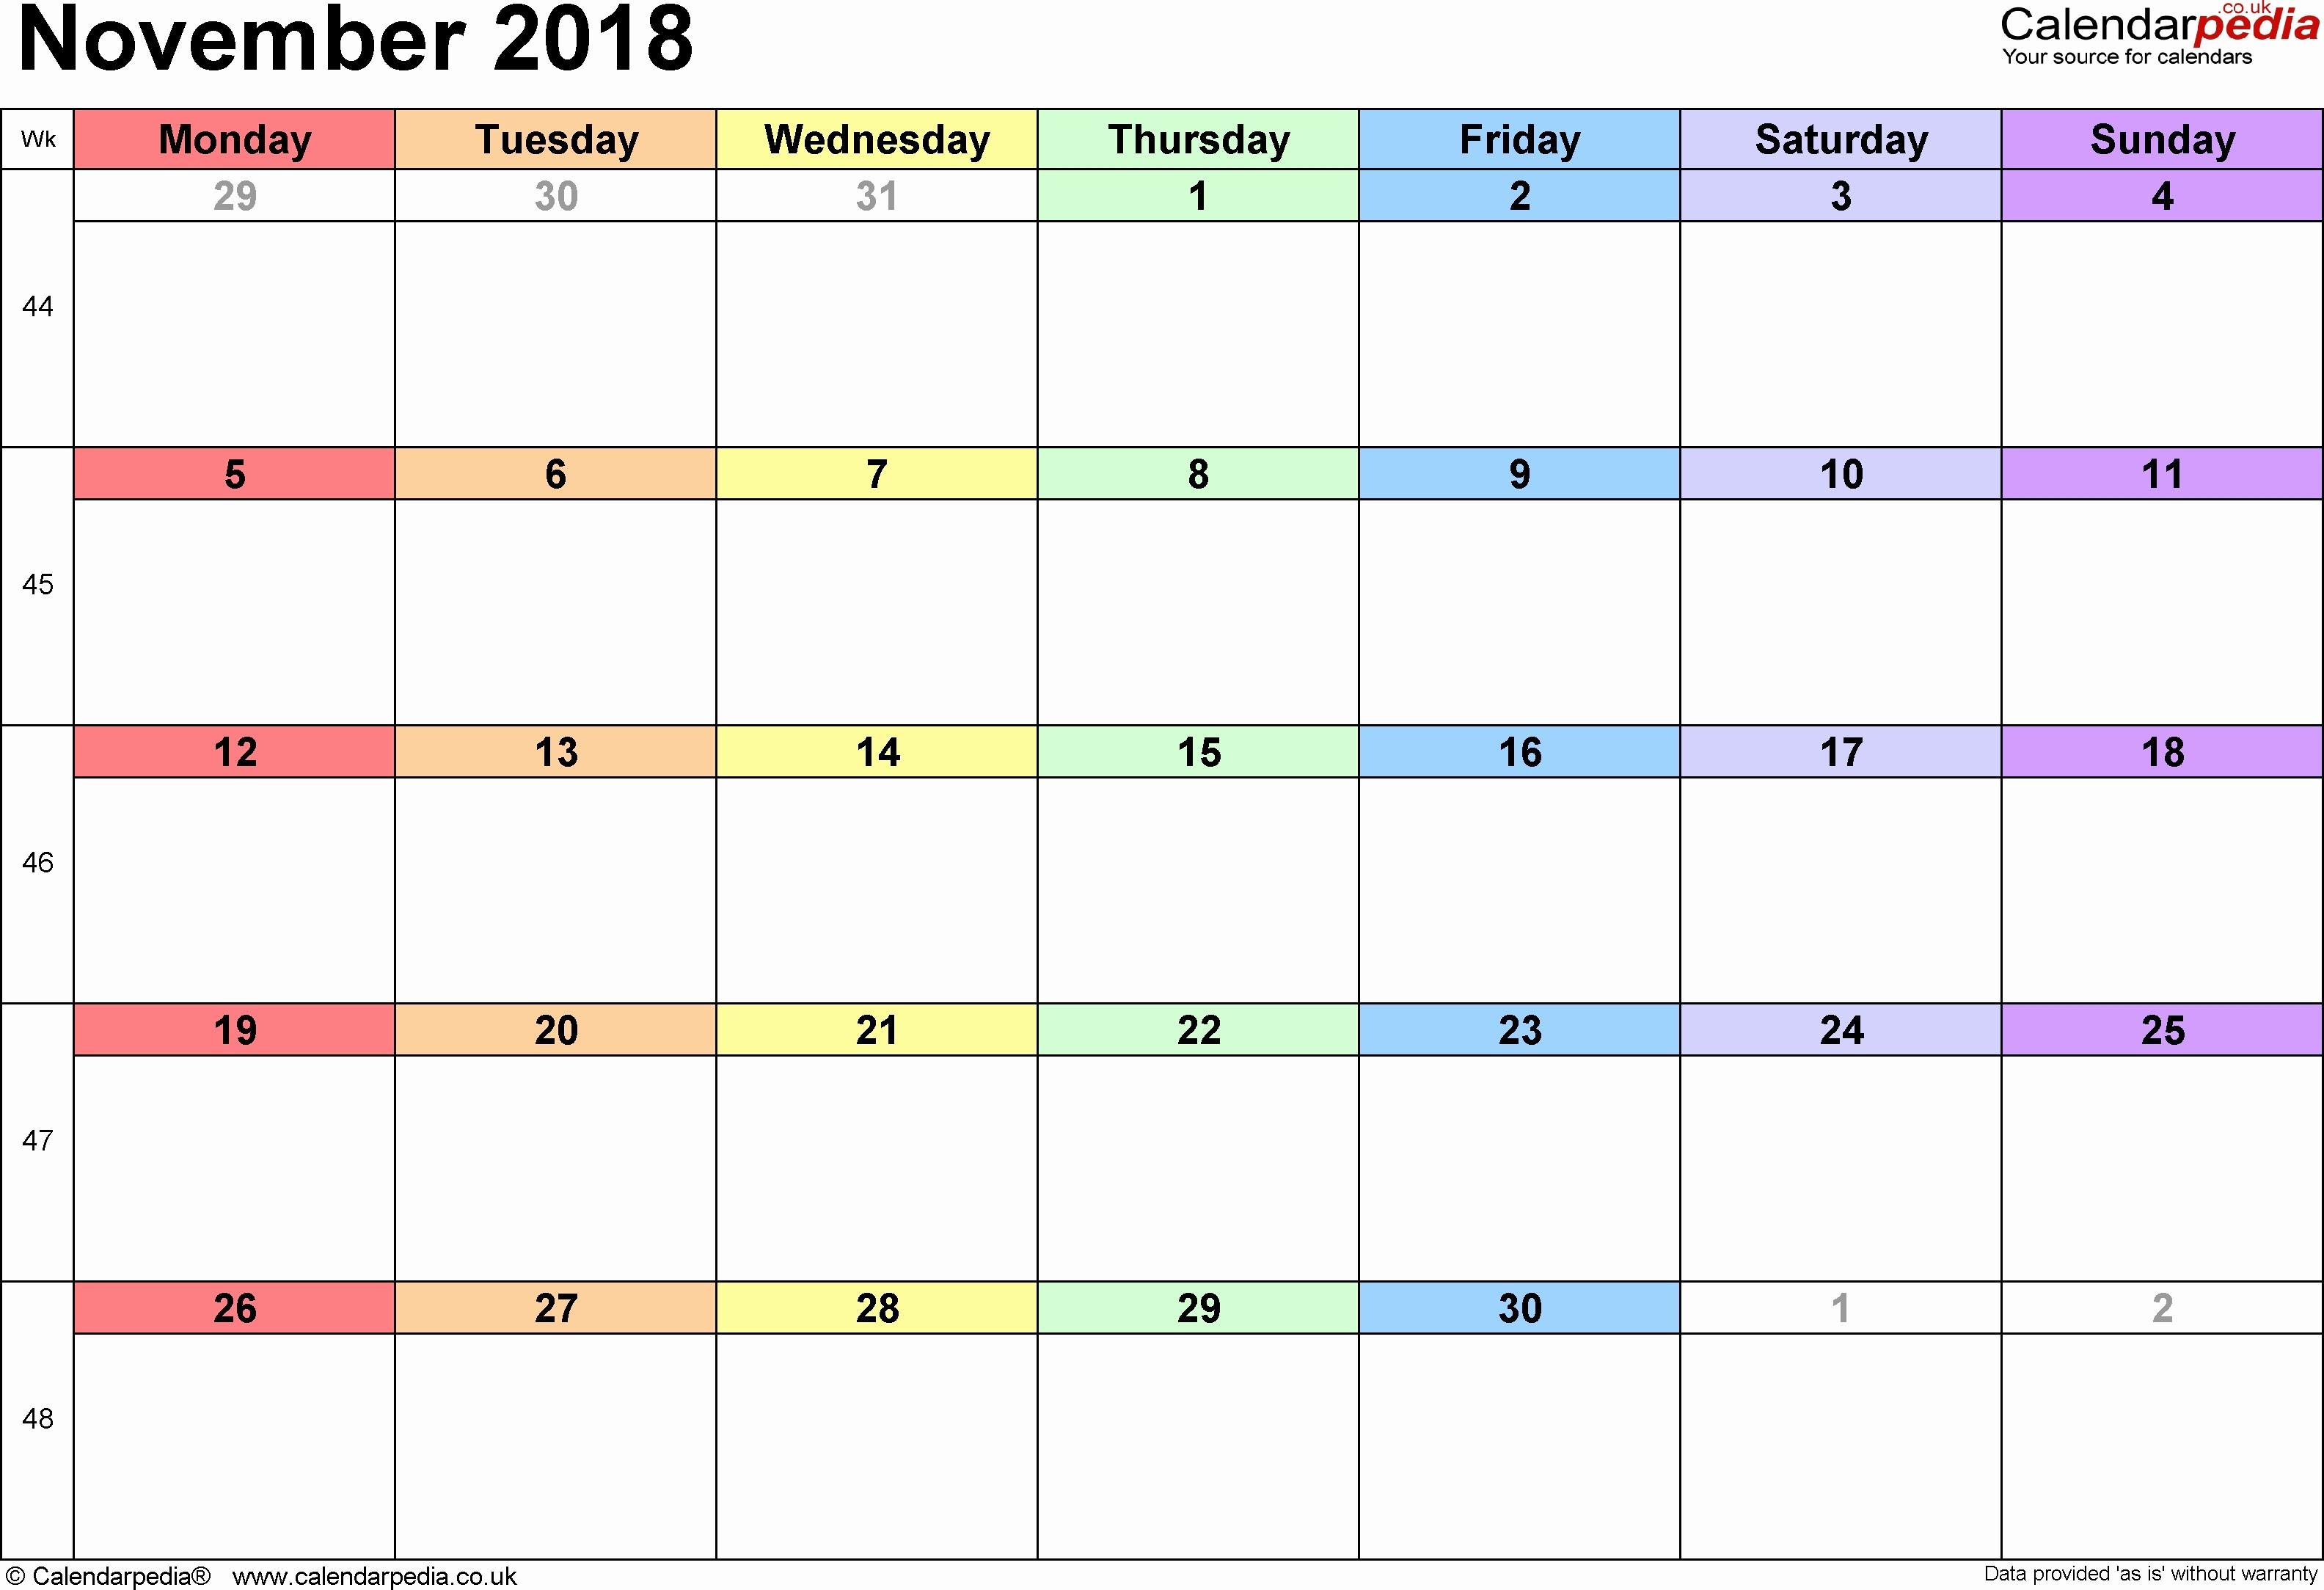 Monday To Sunday Calendar Template Fresh November 2018 Monday intended for Monday To Sunday Calendar Template November